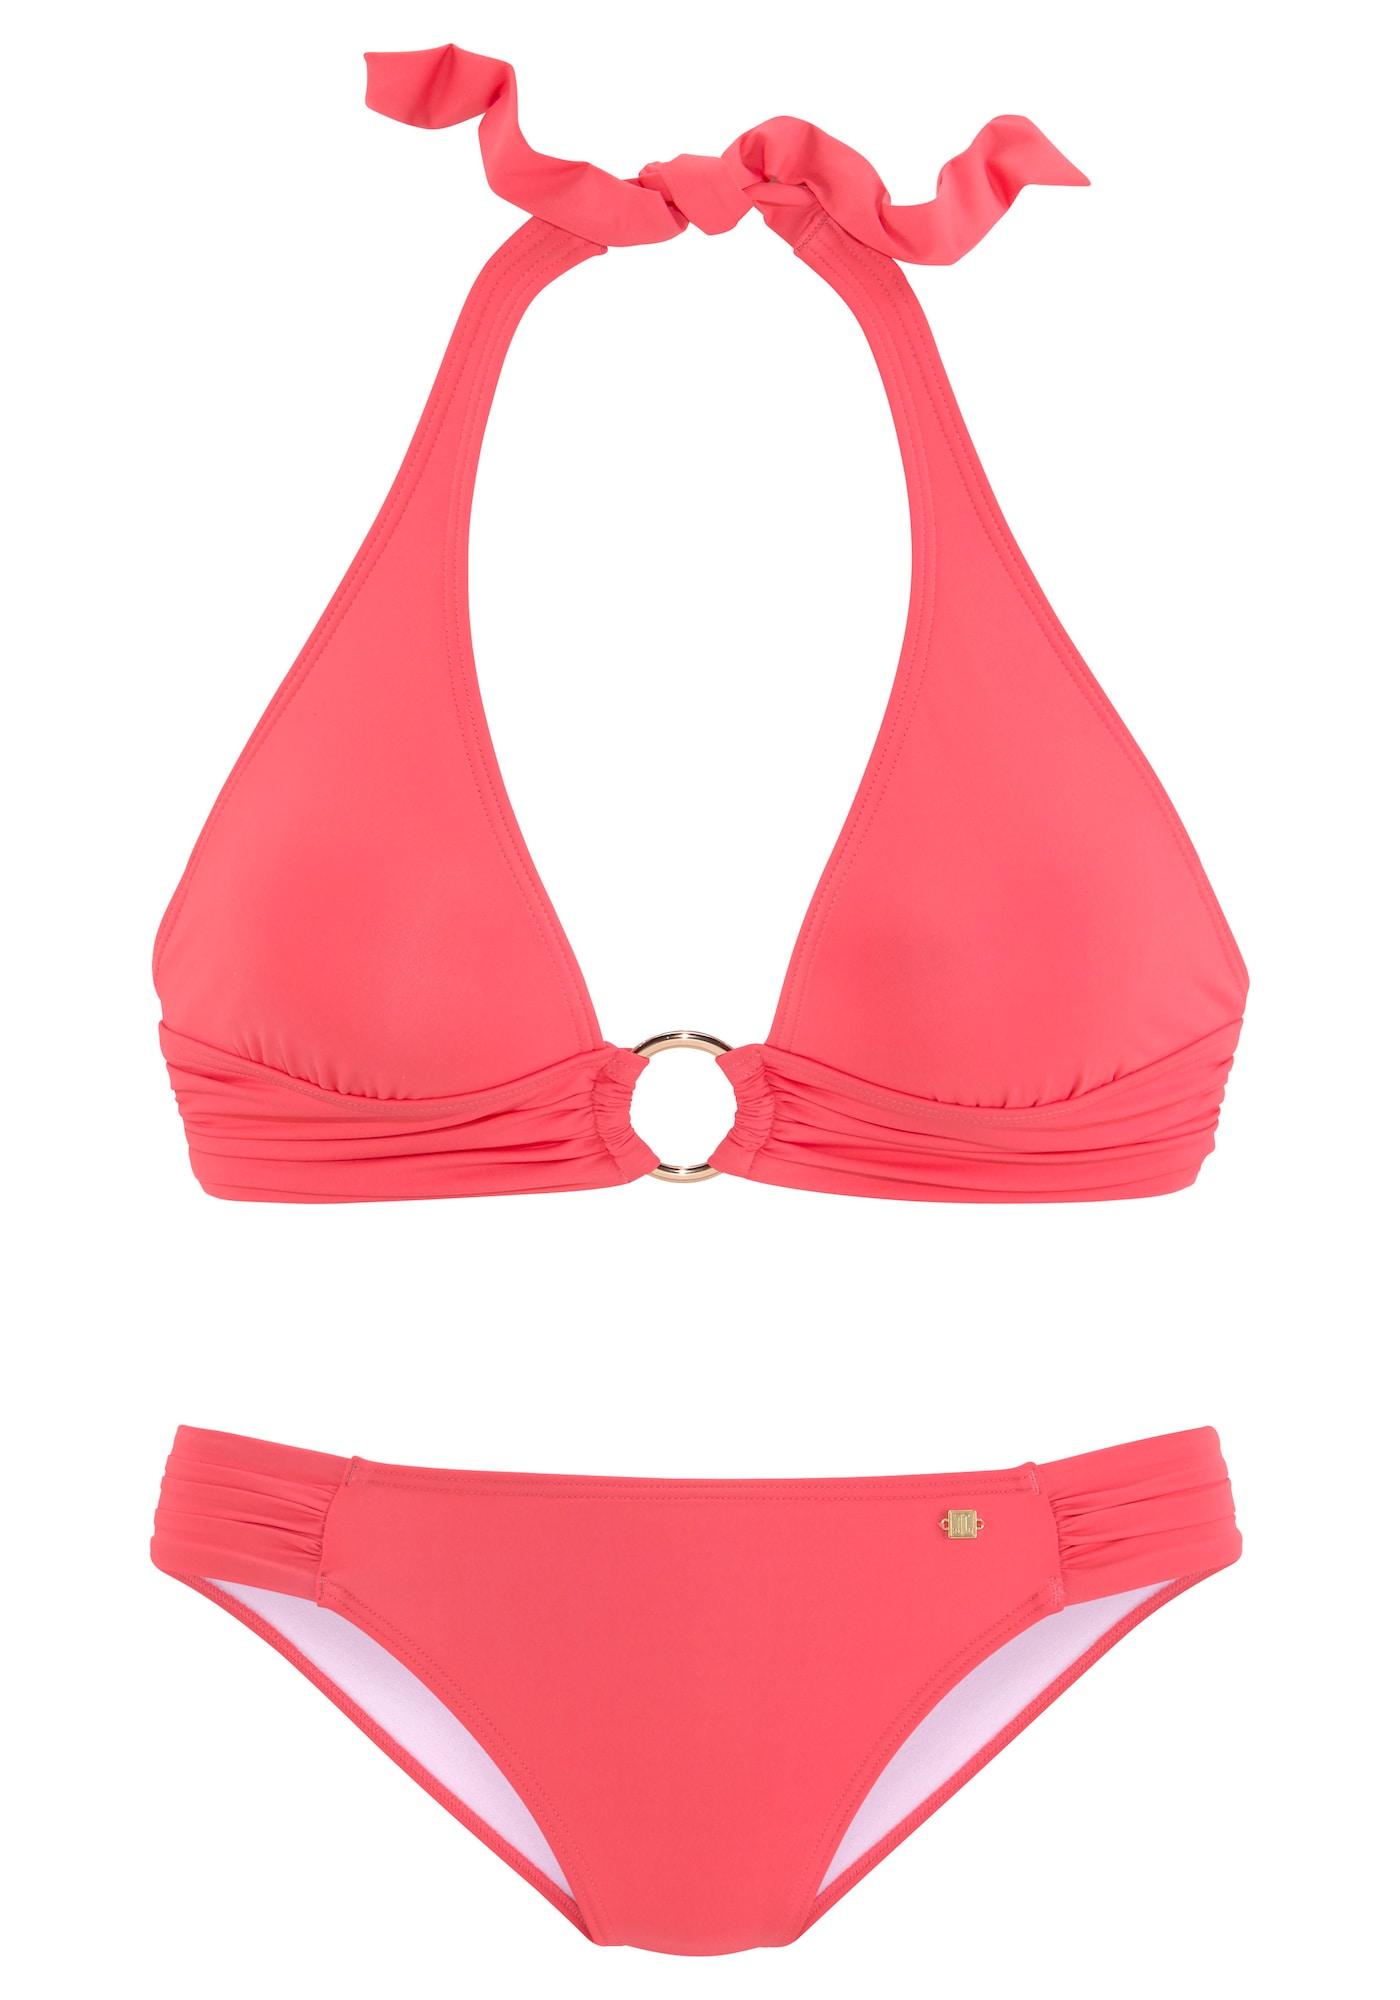 JETTE Bikinis omarų spalva